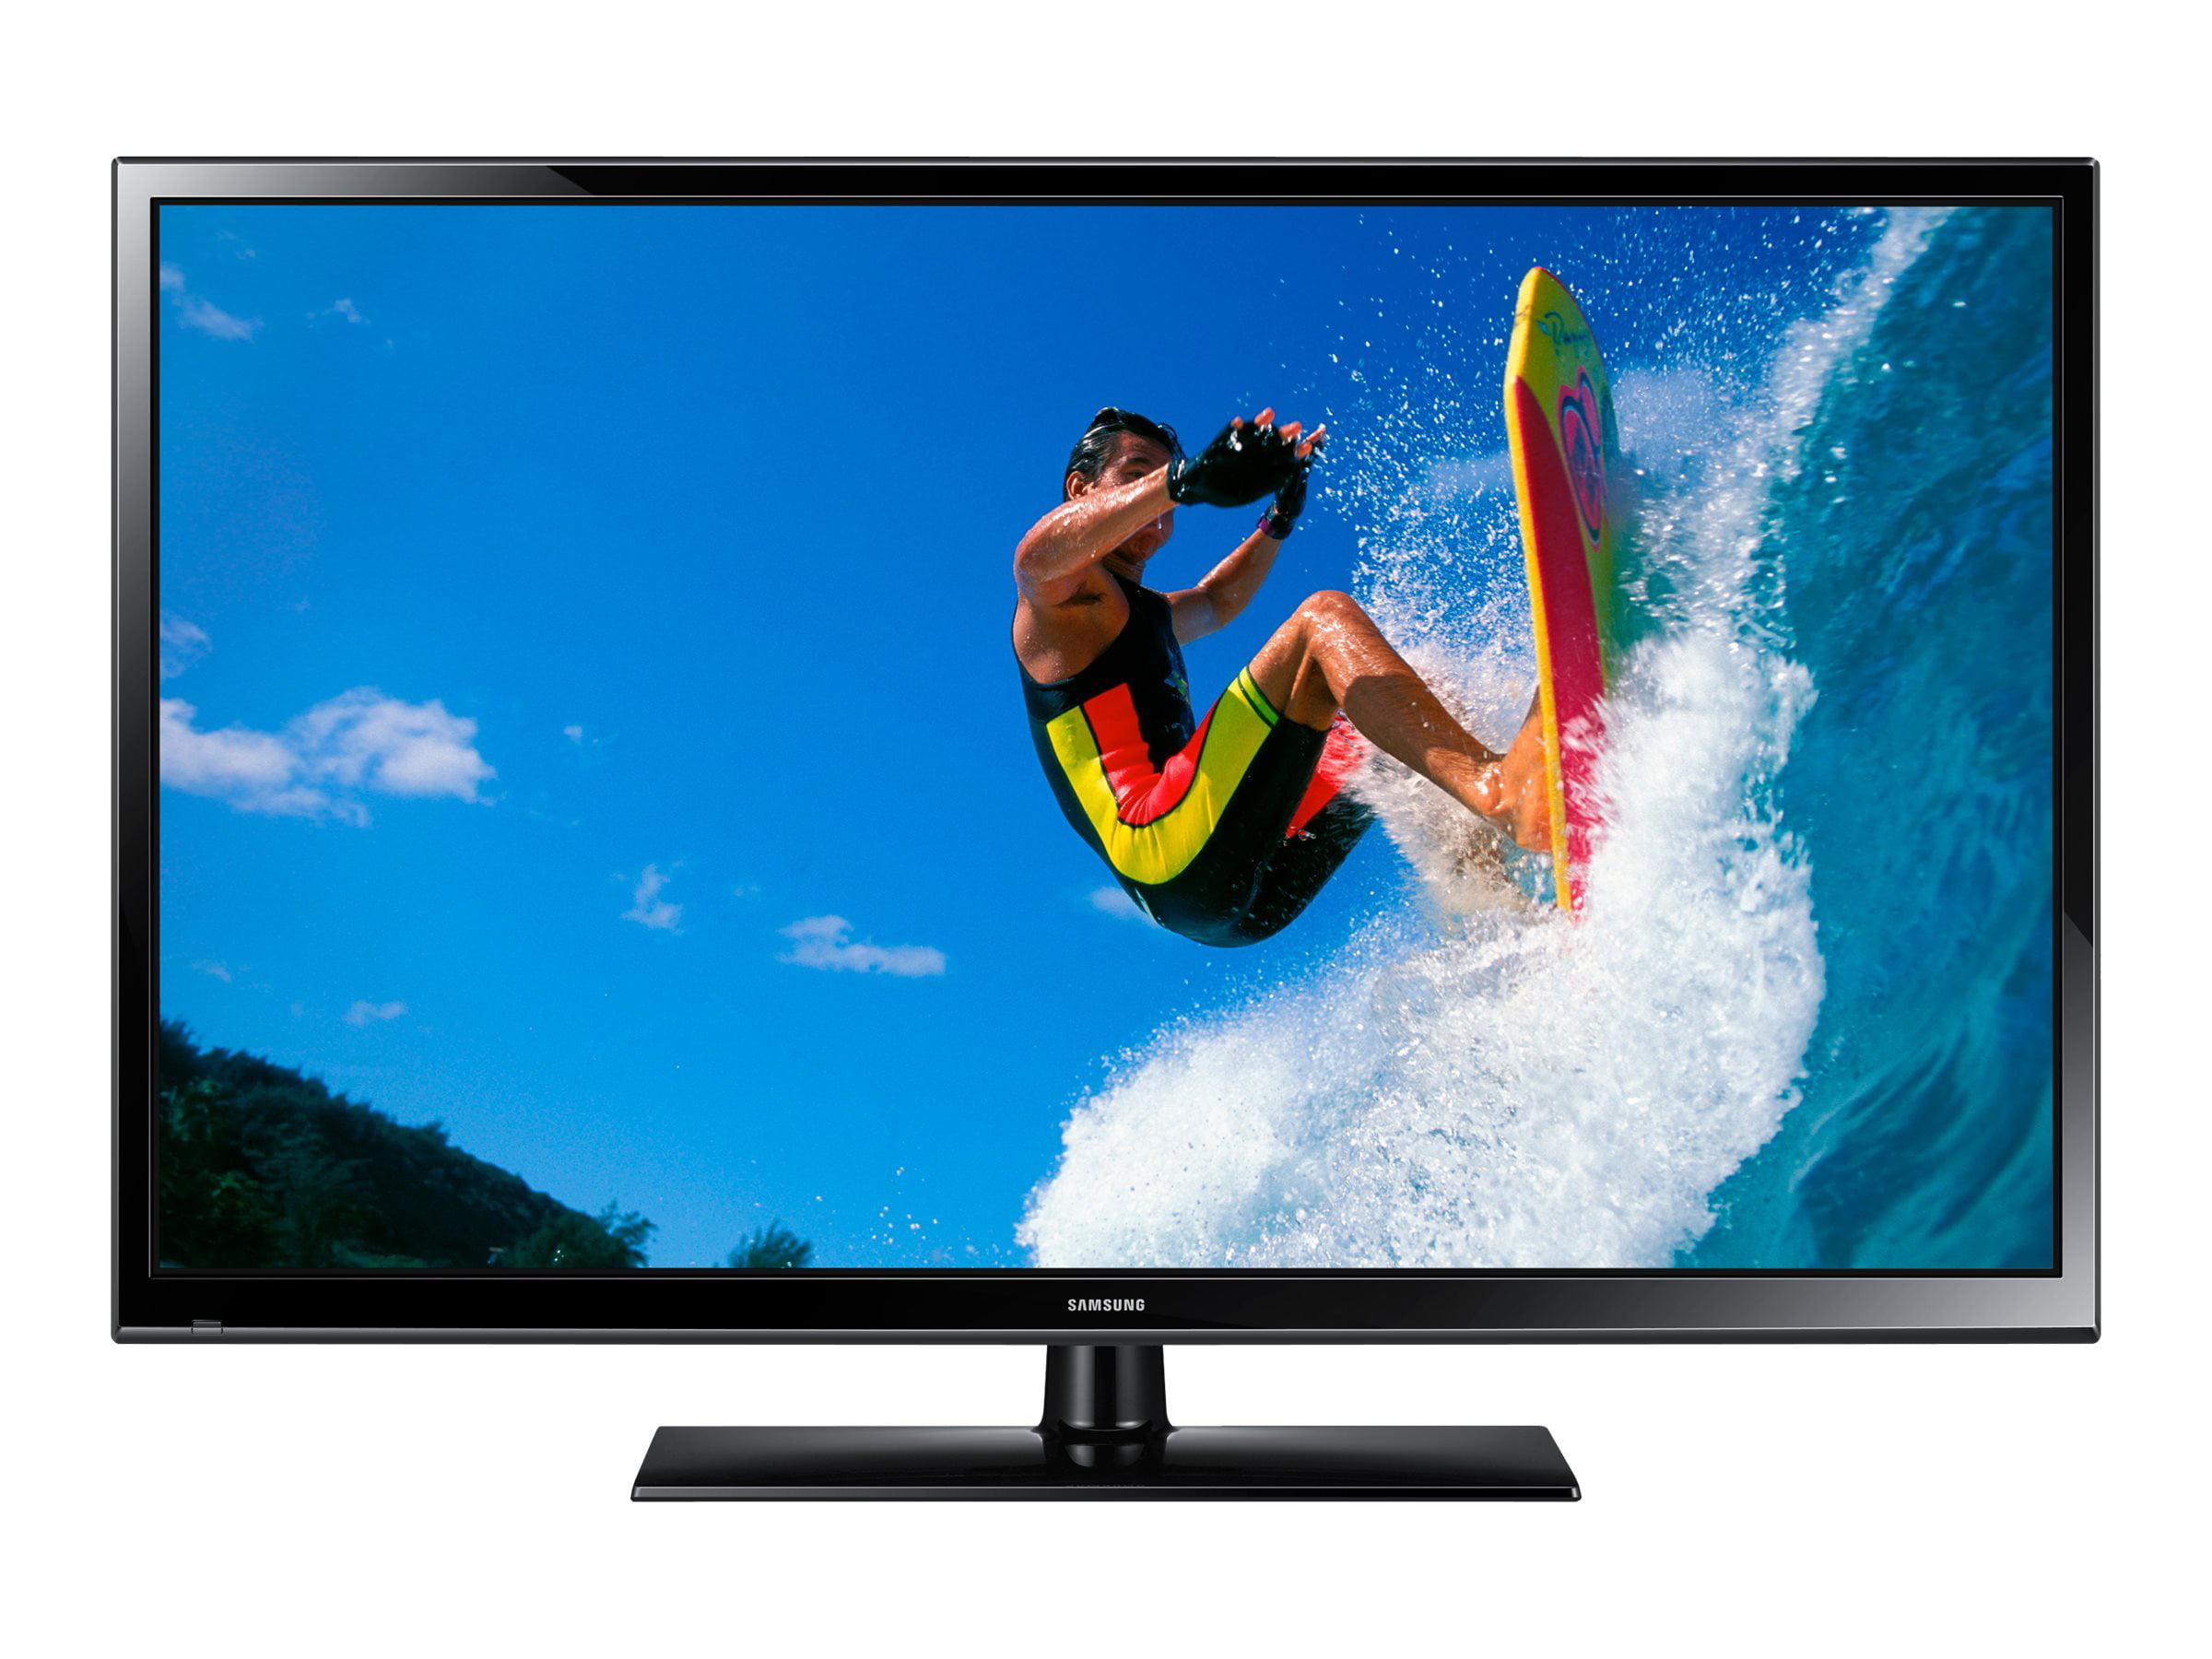 Samsung PN51F4500BFXZA PLASMA F4500 SERIES - PLASMA TV - 51 INCH - 1024 X  768 - 720P - 4:3 - DTS STUDIO - Walmart.com